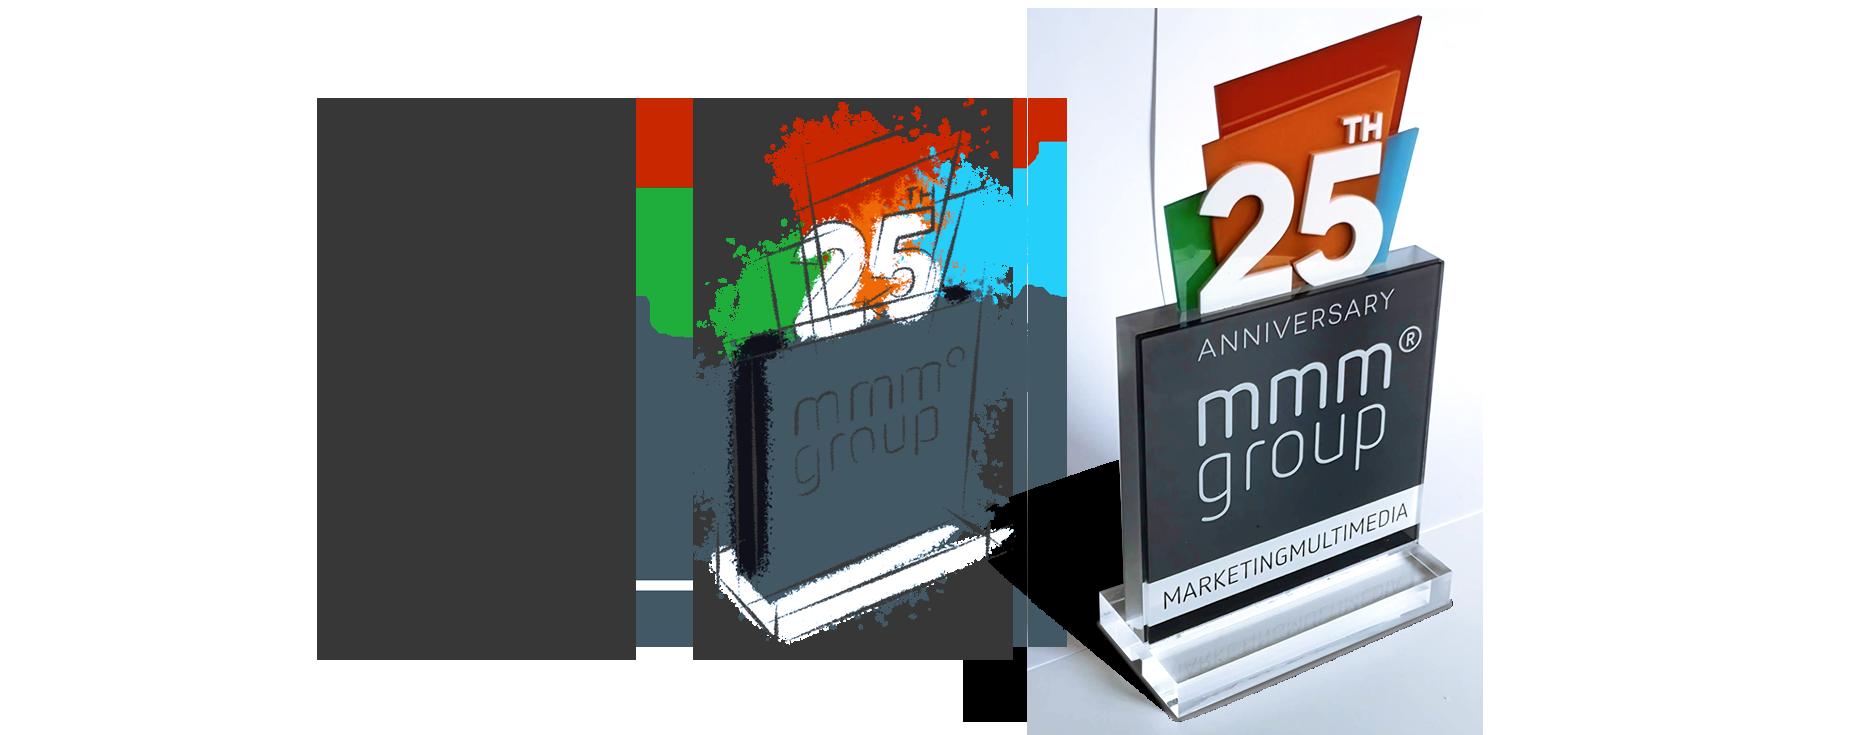 Trofeo_MMM group_Process.jpg